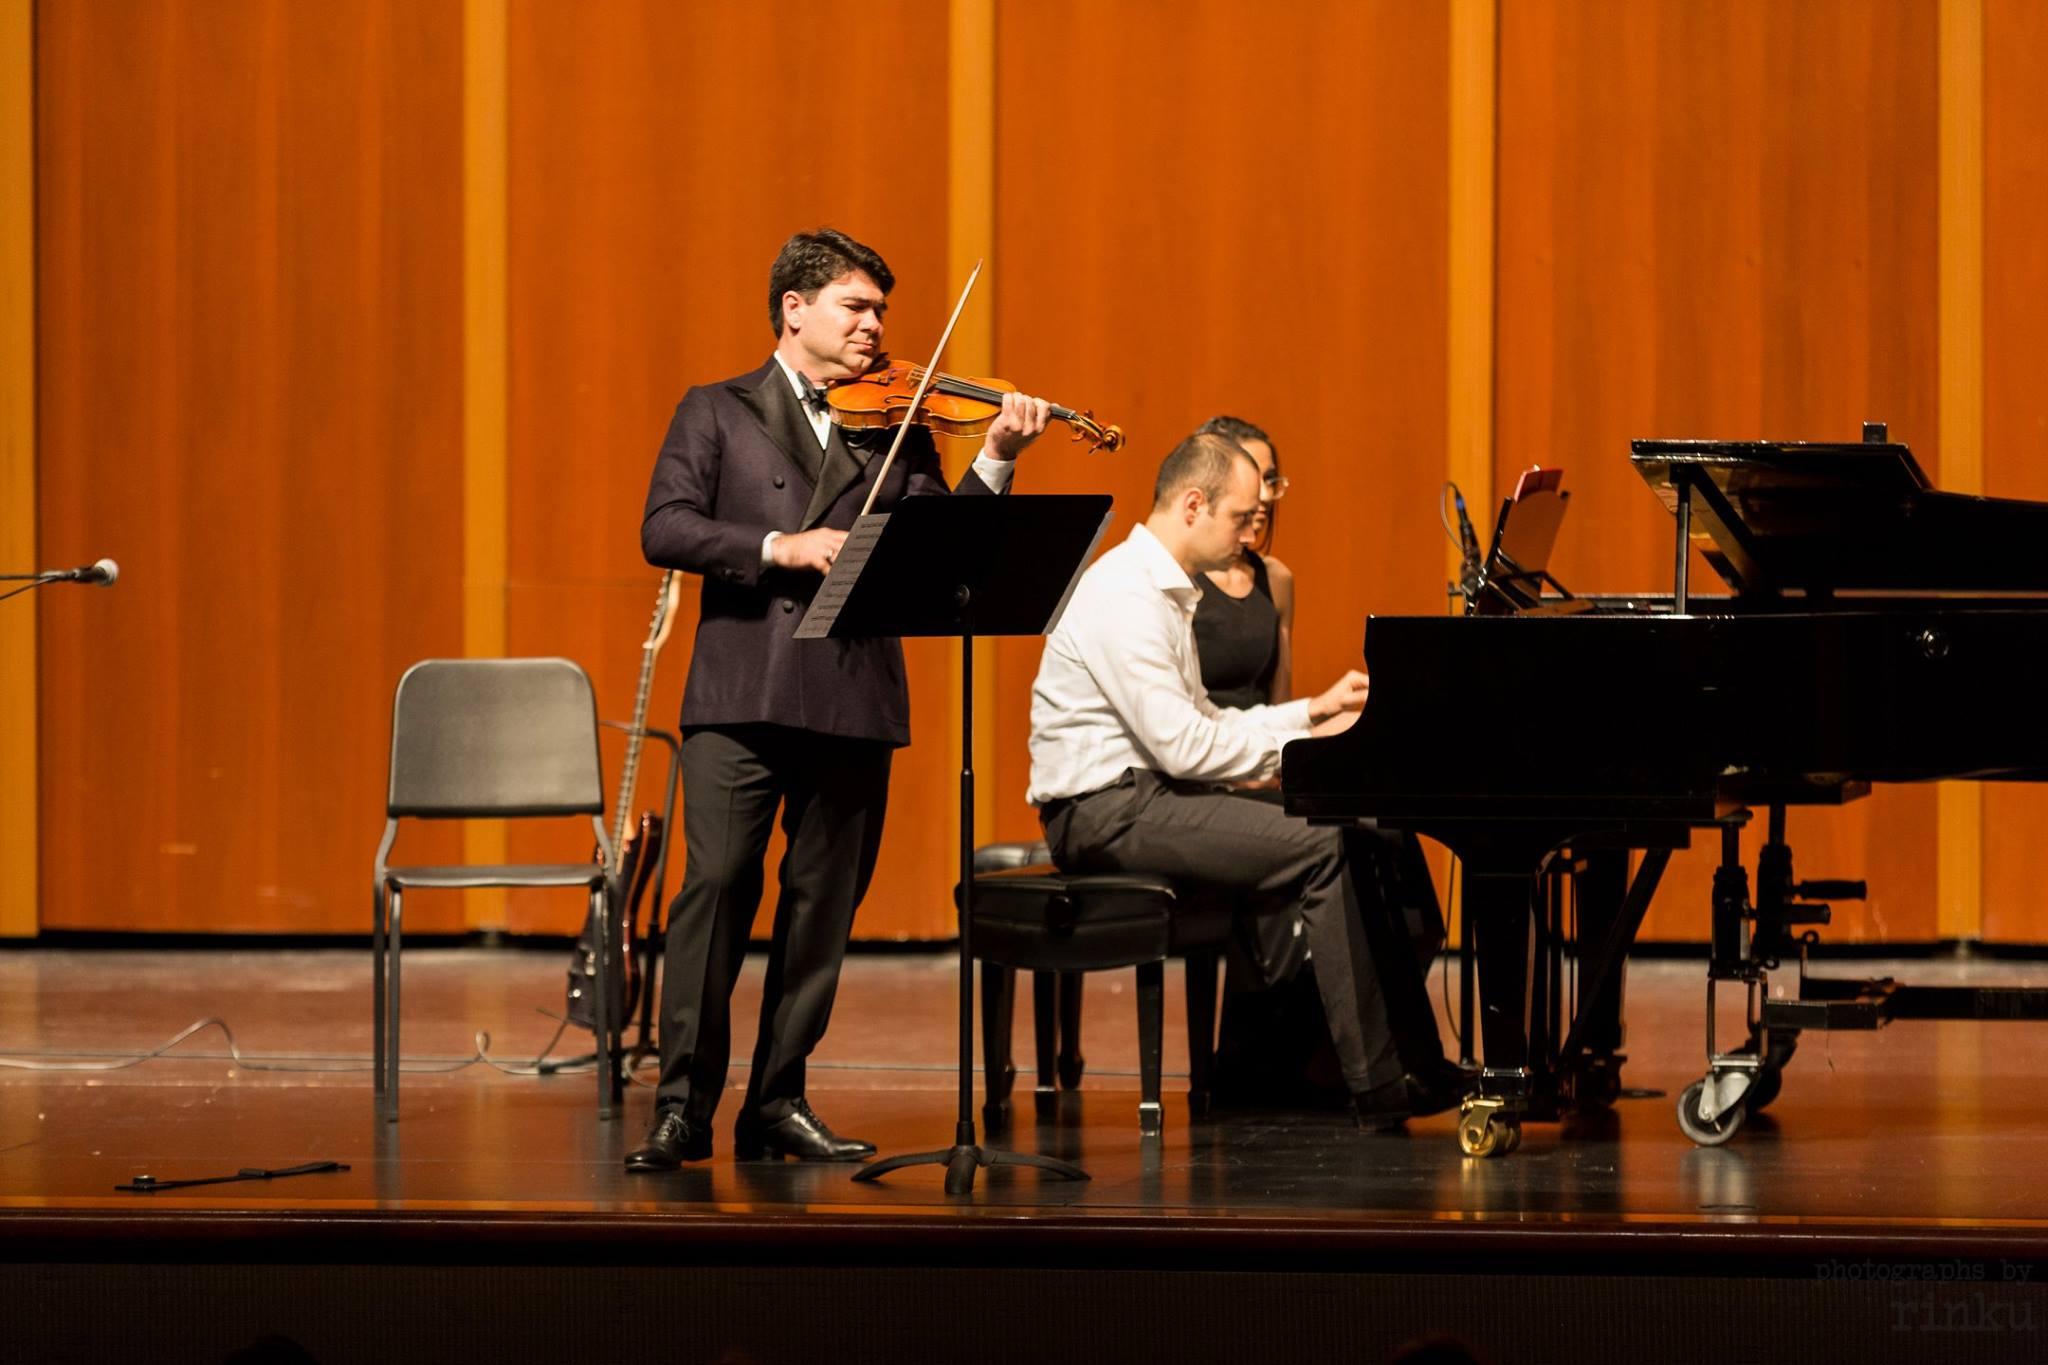 Zeljko Pavlovic and Krume – Faculty Concert 2018